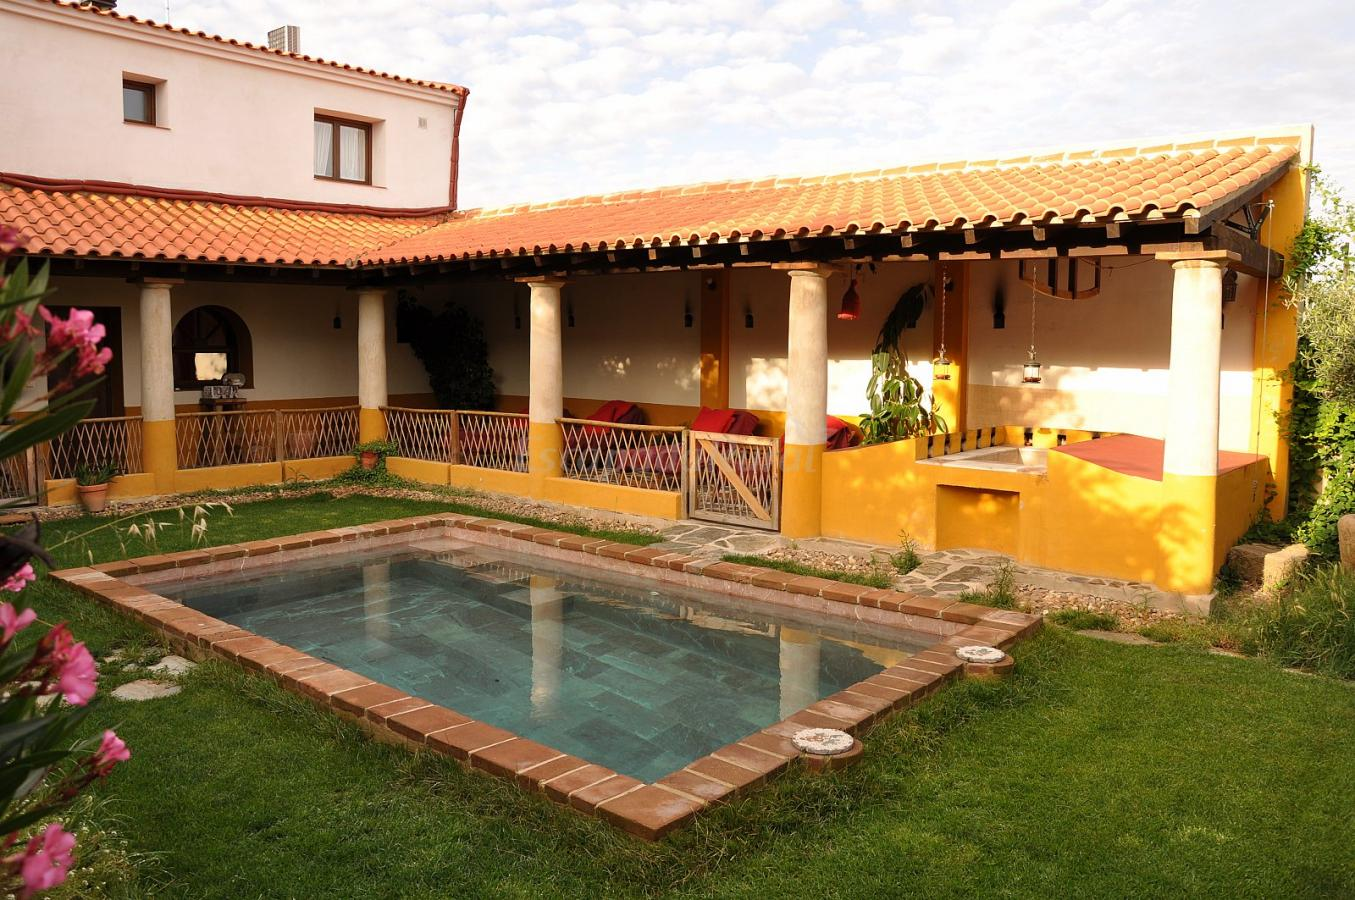 Fotos de termas aqua libera casa rural en aljuc n badajoz for Casas rurales en badajoz con piscina